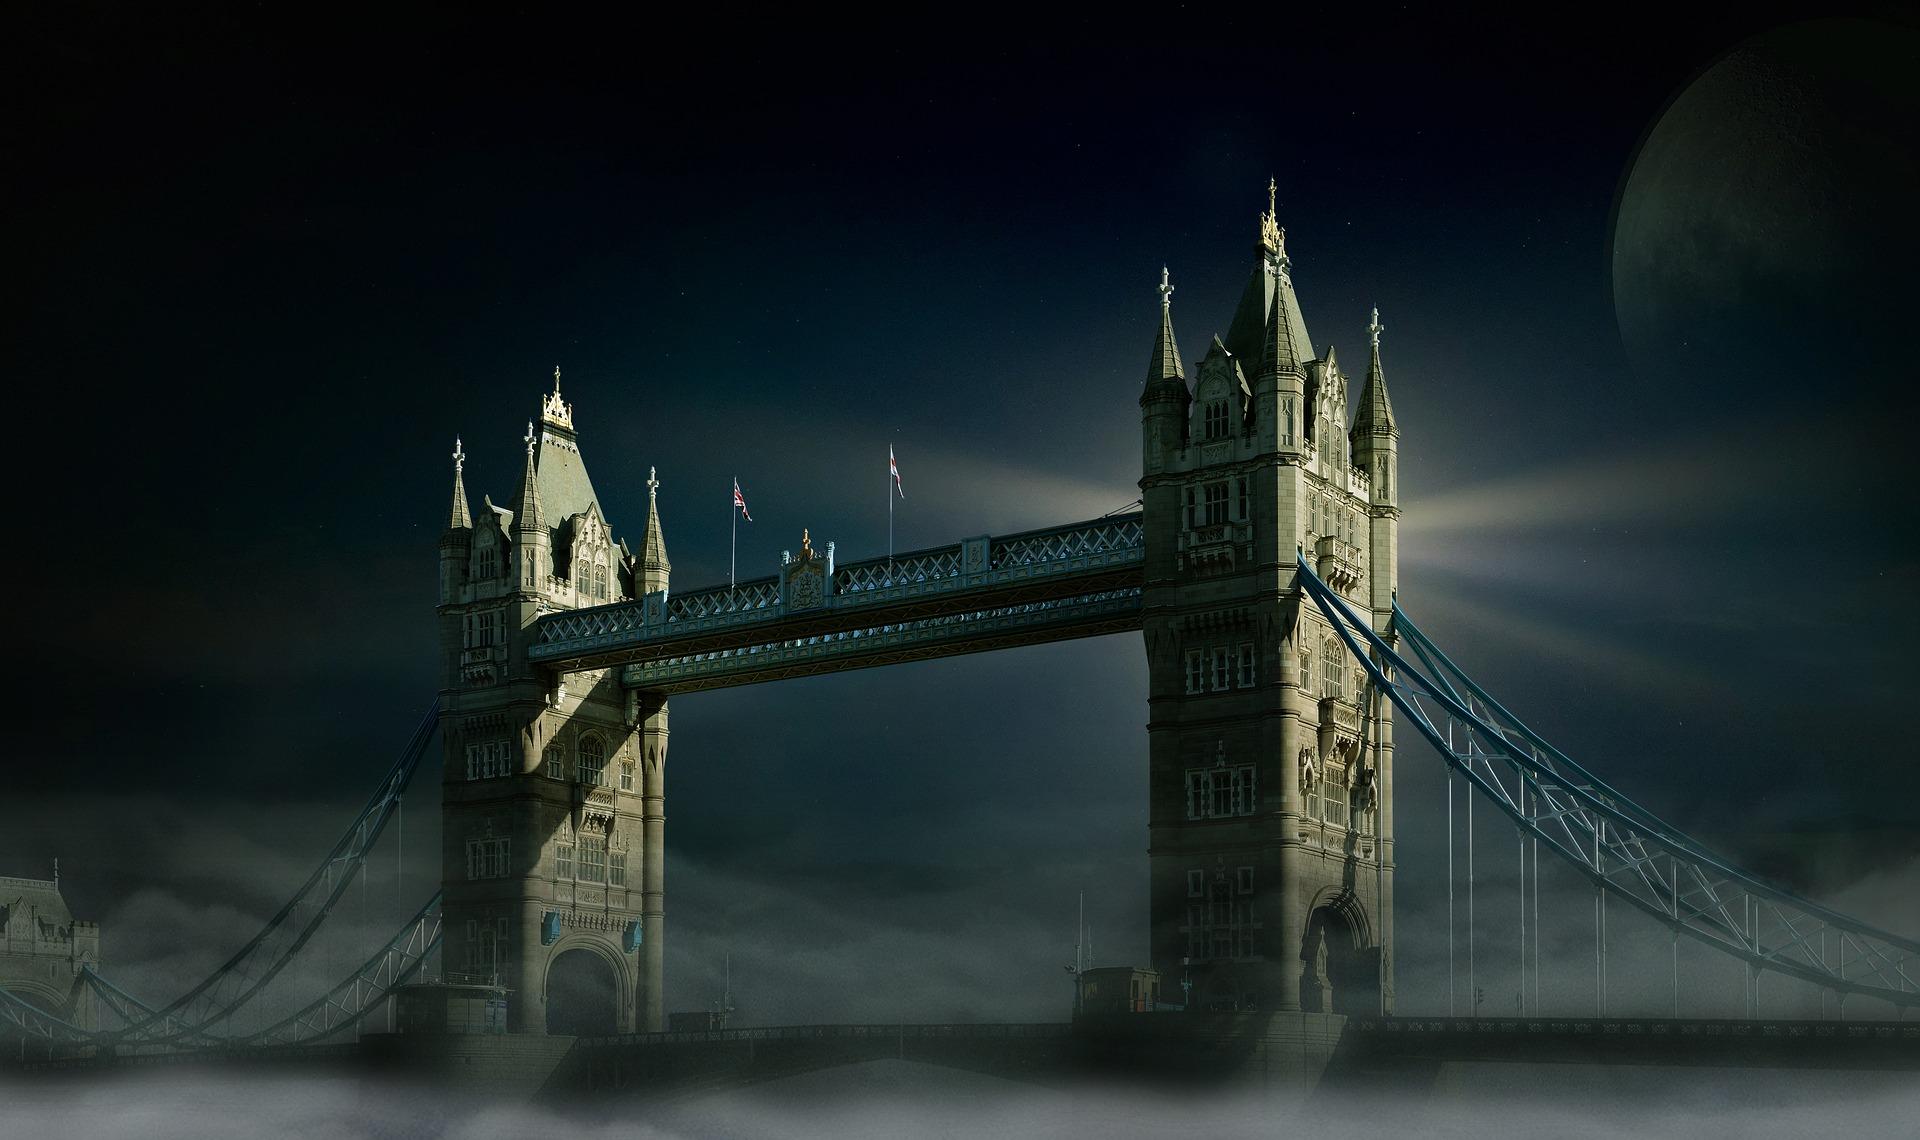 tower-bridge-2324875_1920.jpg?1567518814